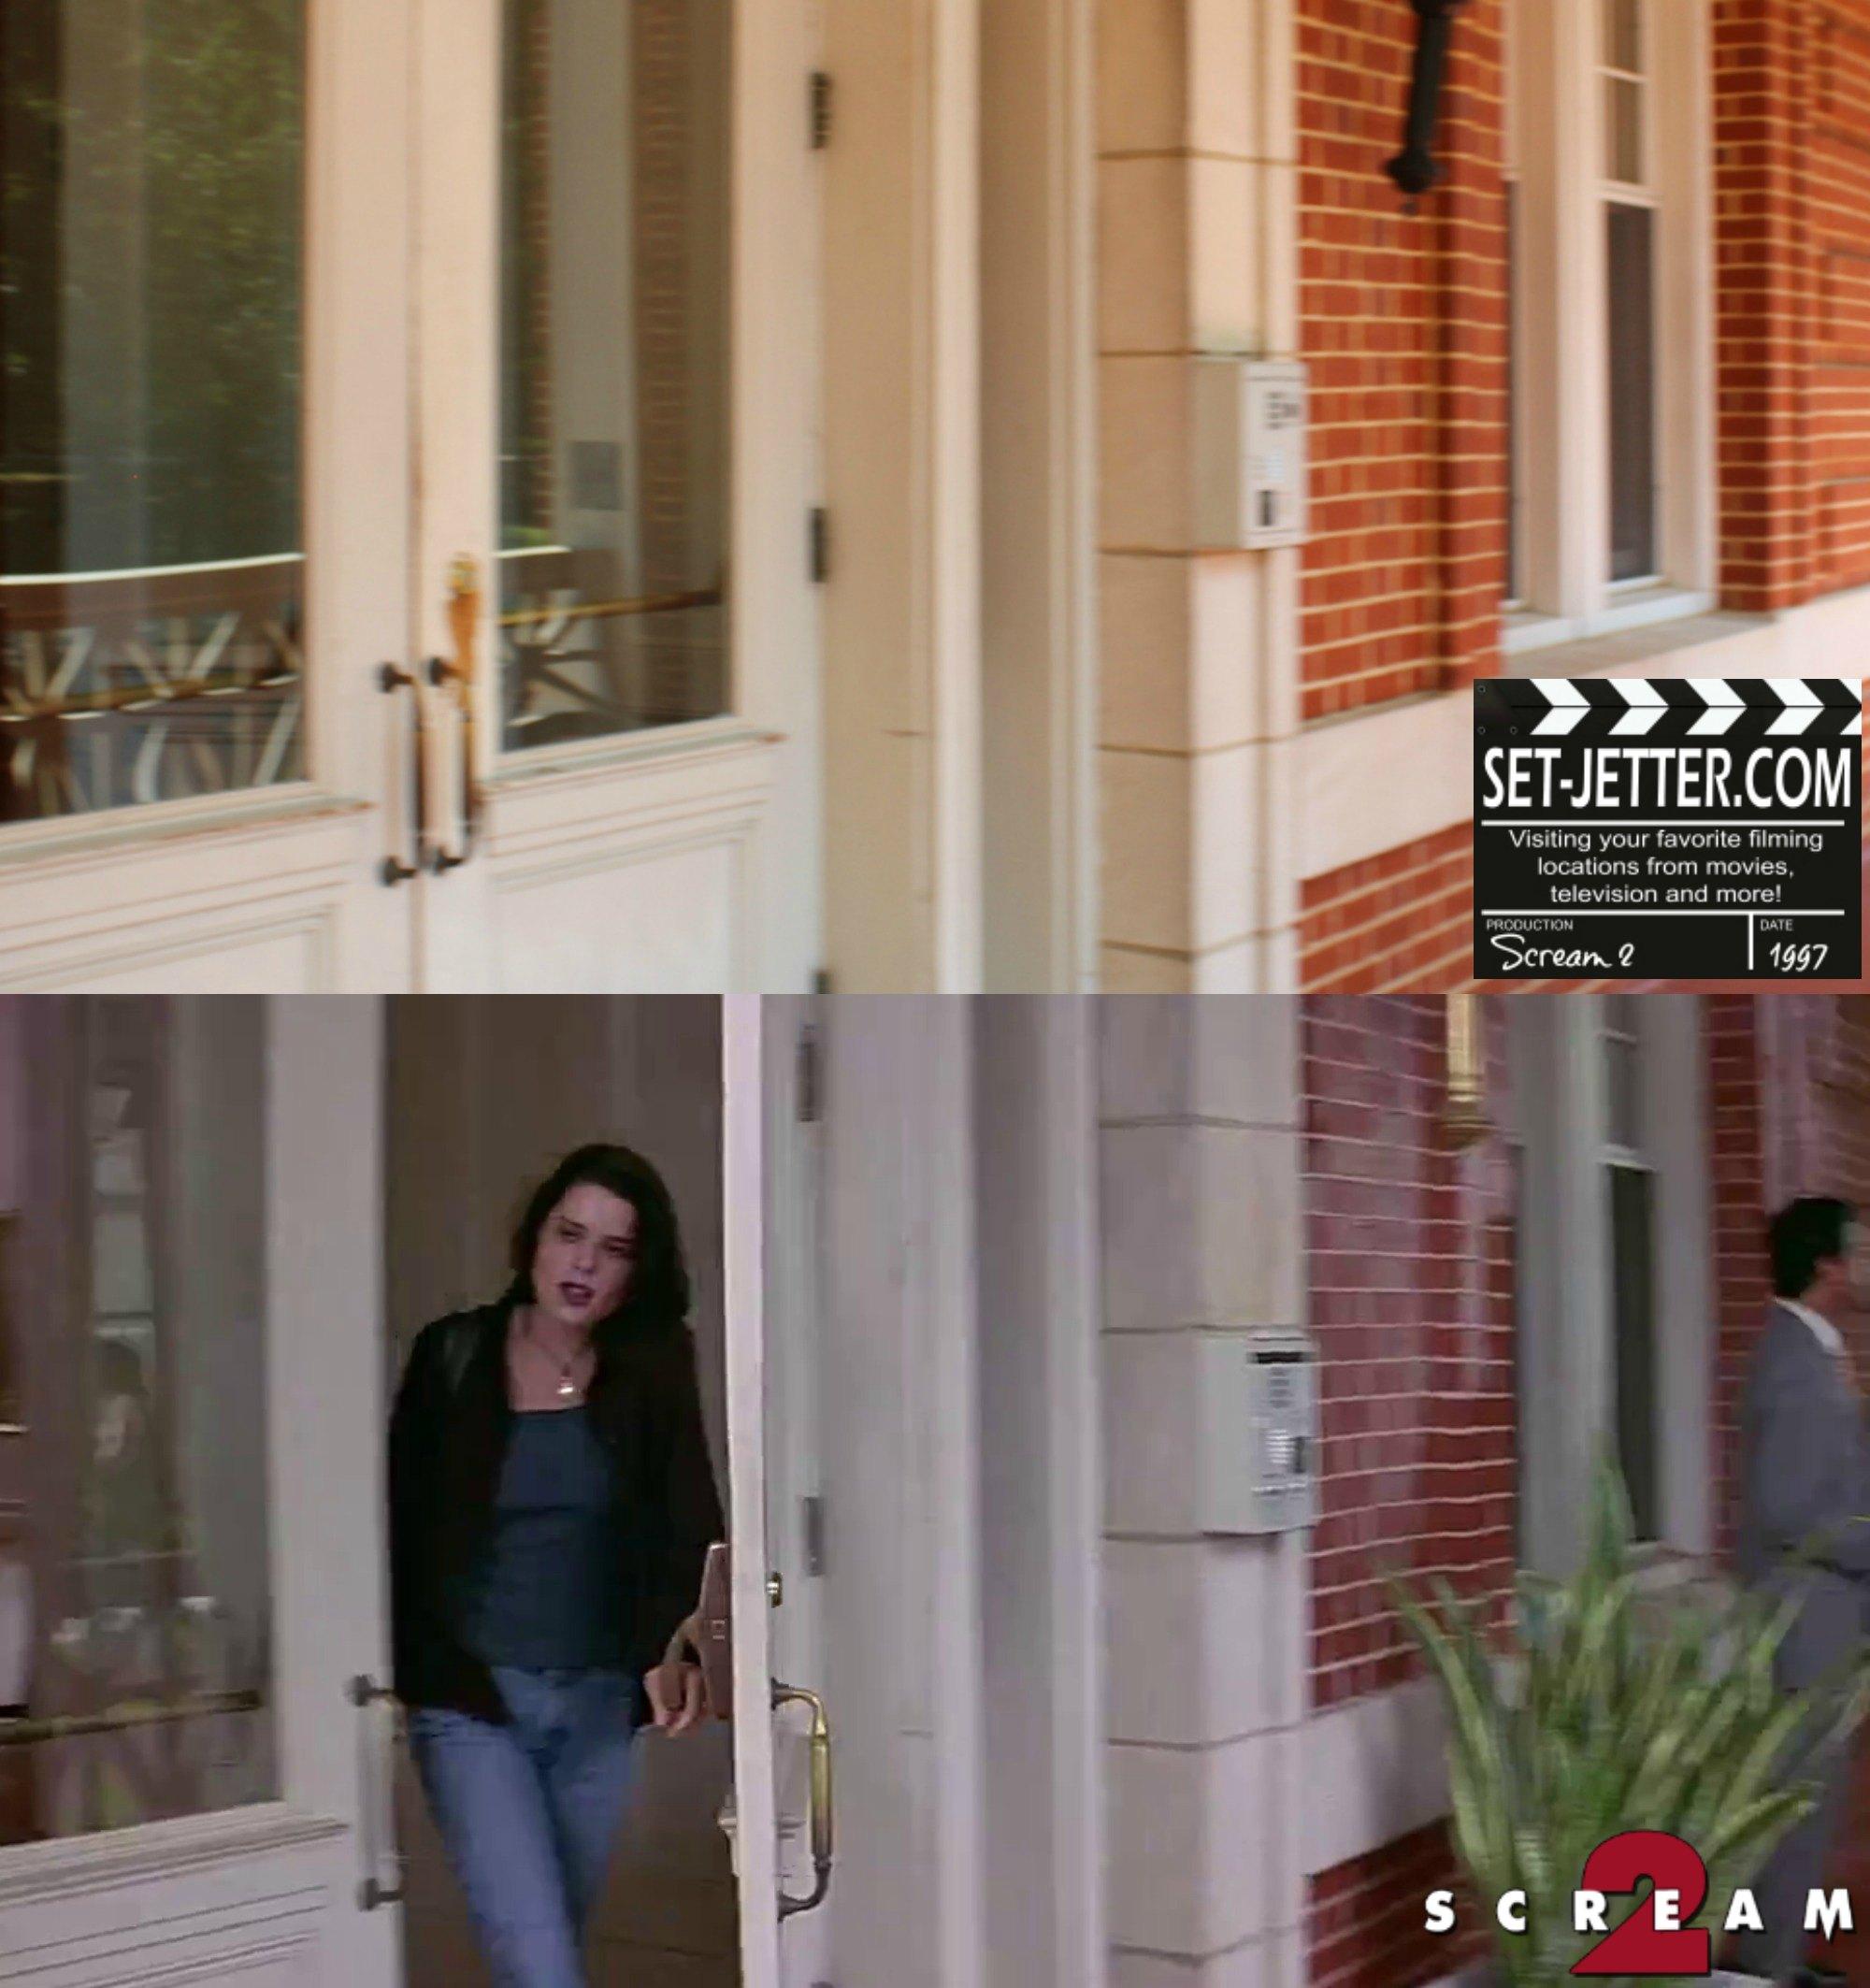 Scream 2 comparison 22.jpg